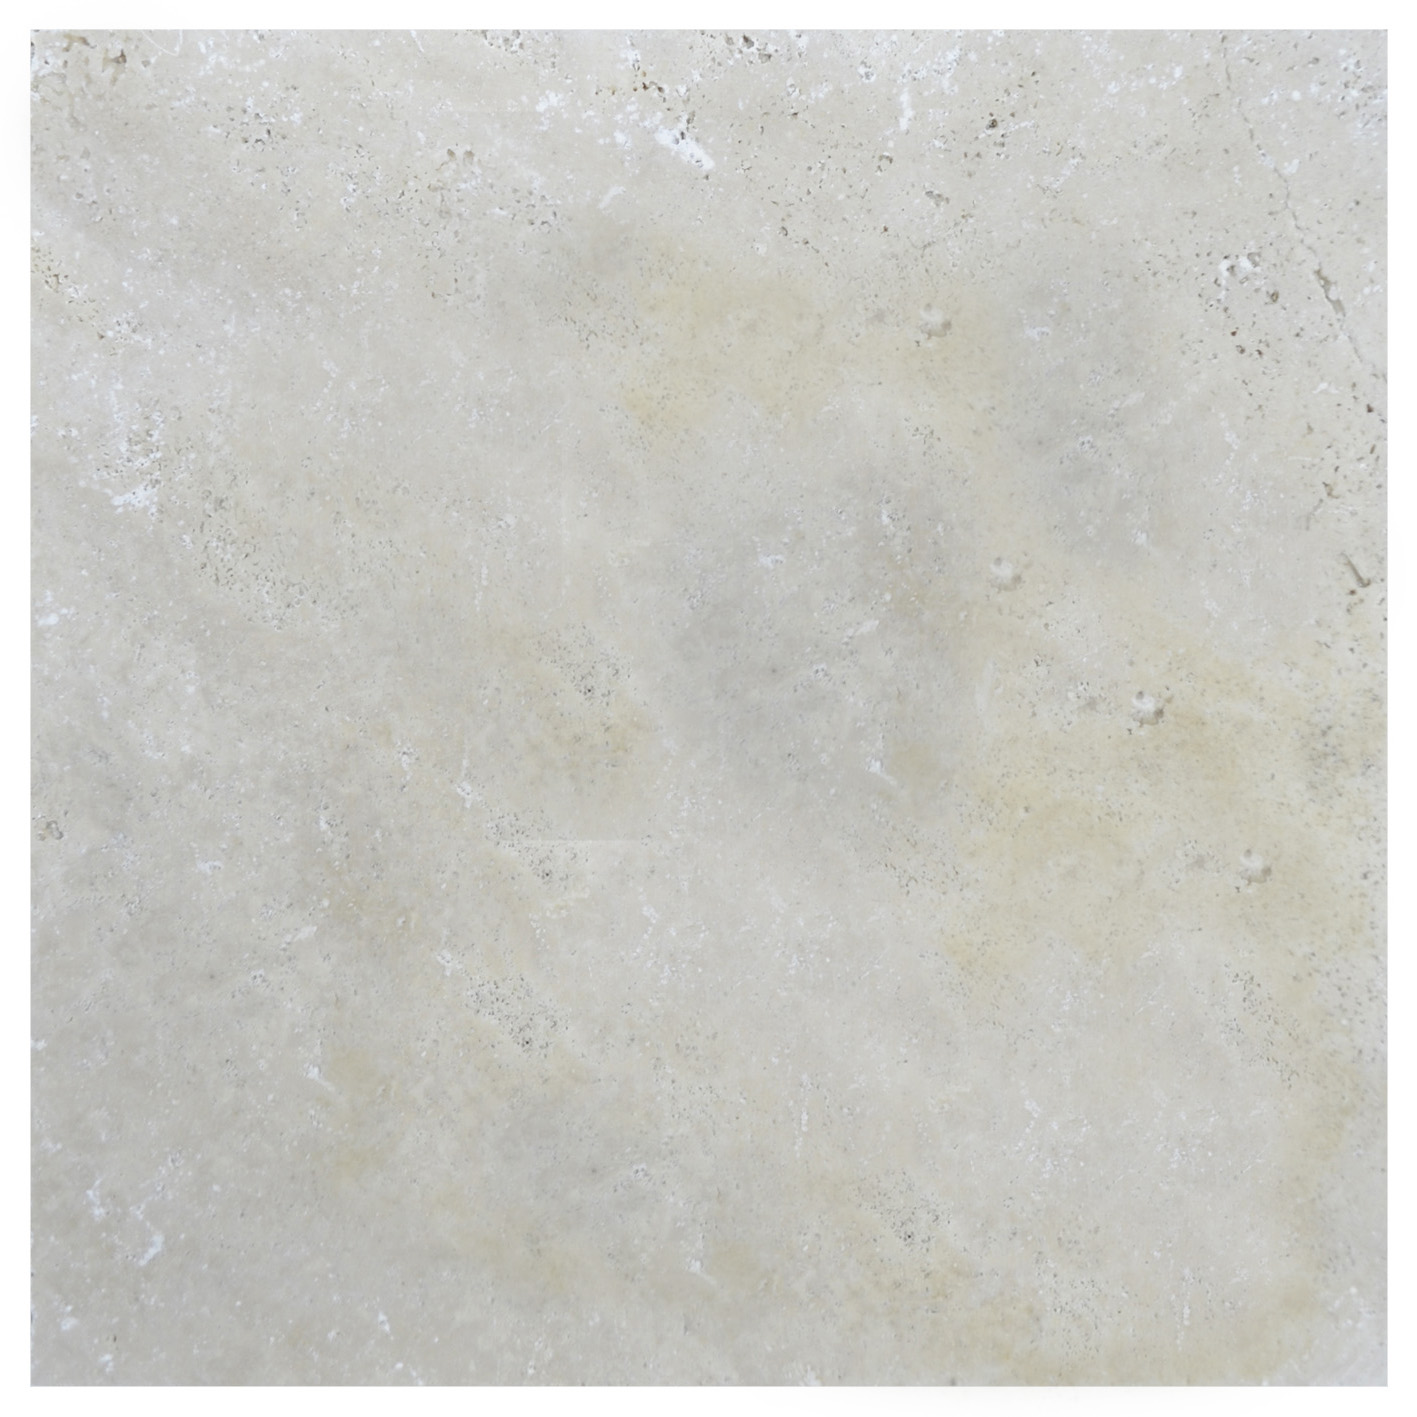 Ivory Tumbled Travertine Pavers 12x12